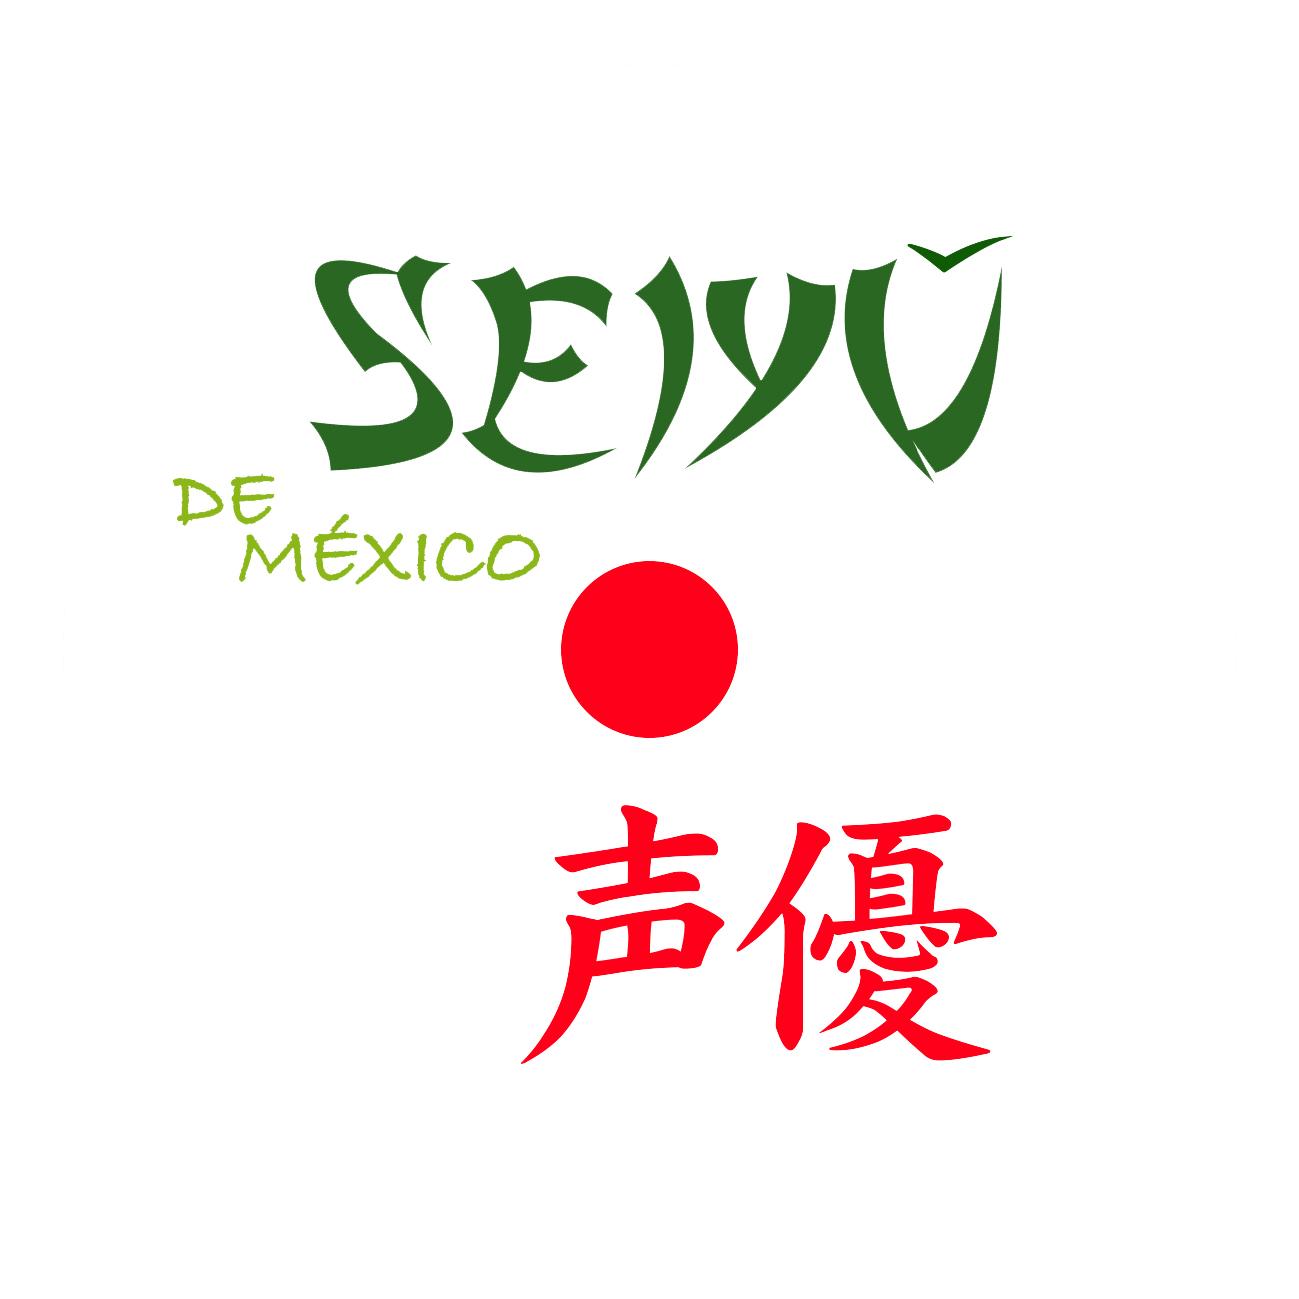 Seiyu de México S.A. de C.V.